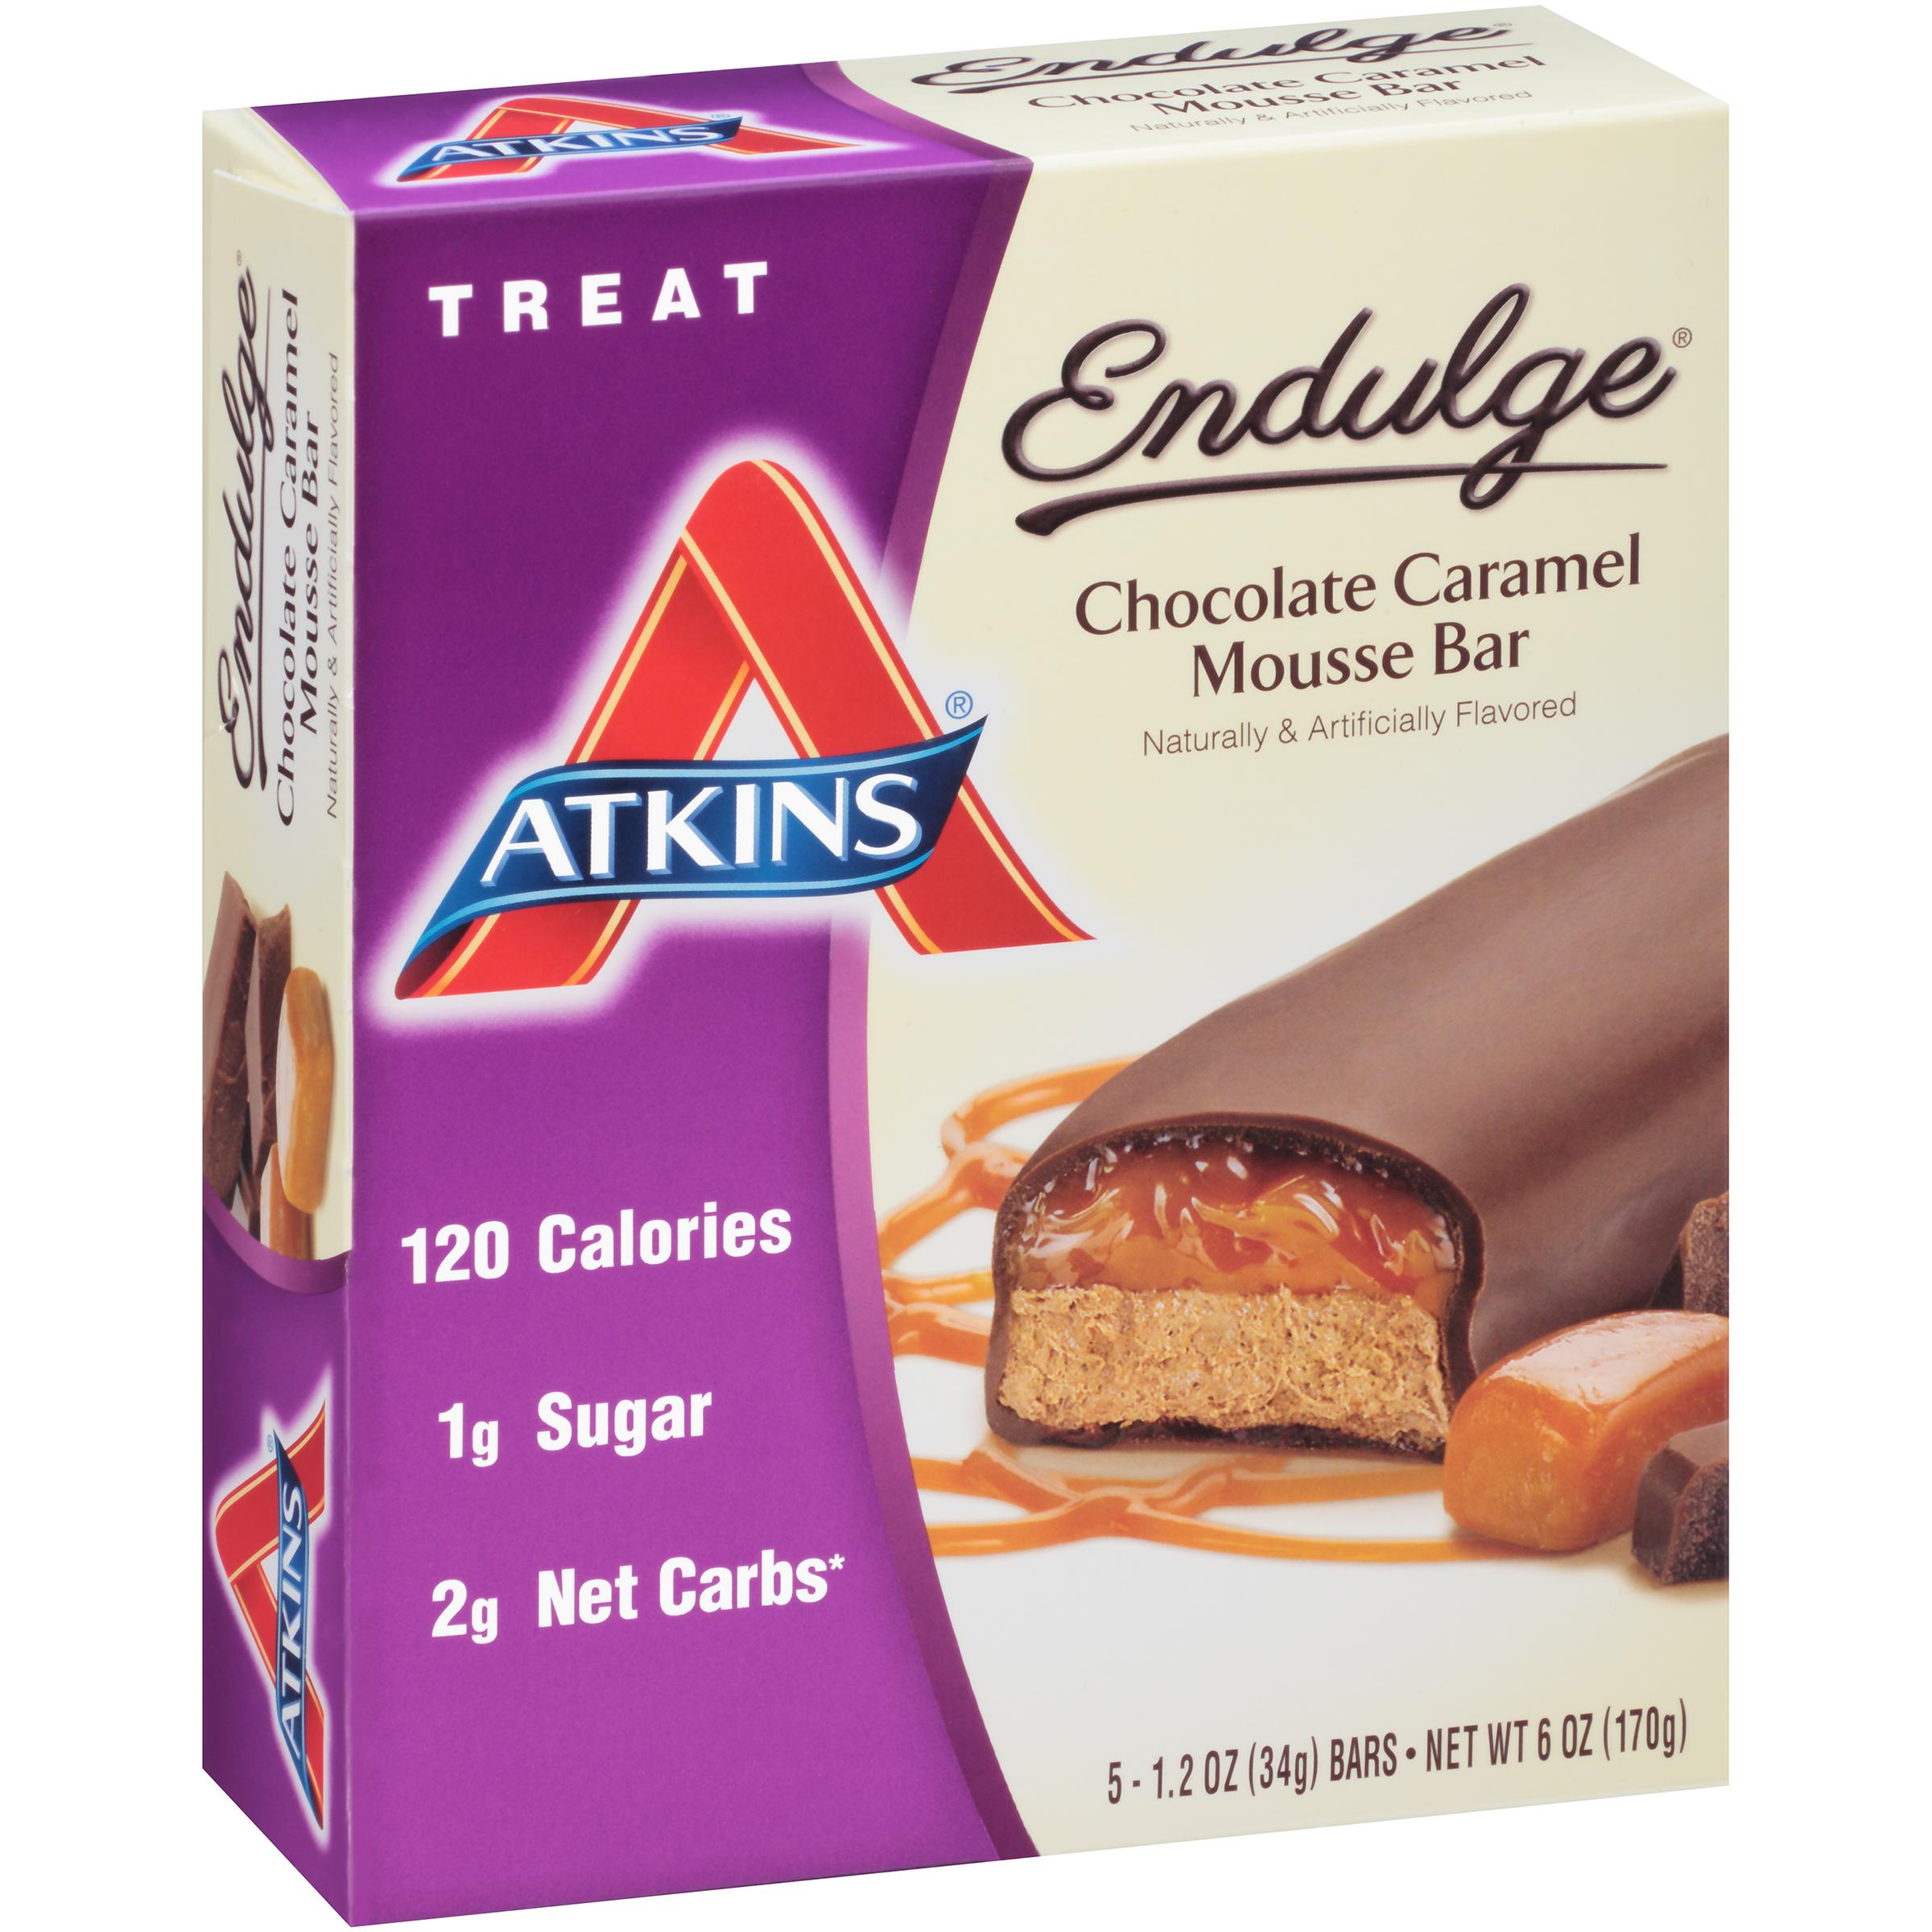 Atkins Endulge Chocolate Caramel Mousse Bars 5-pack